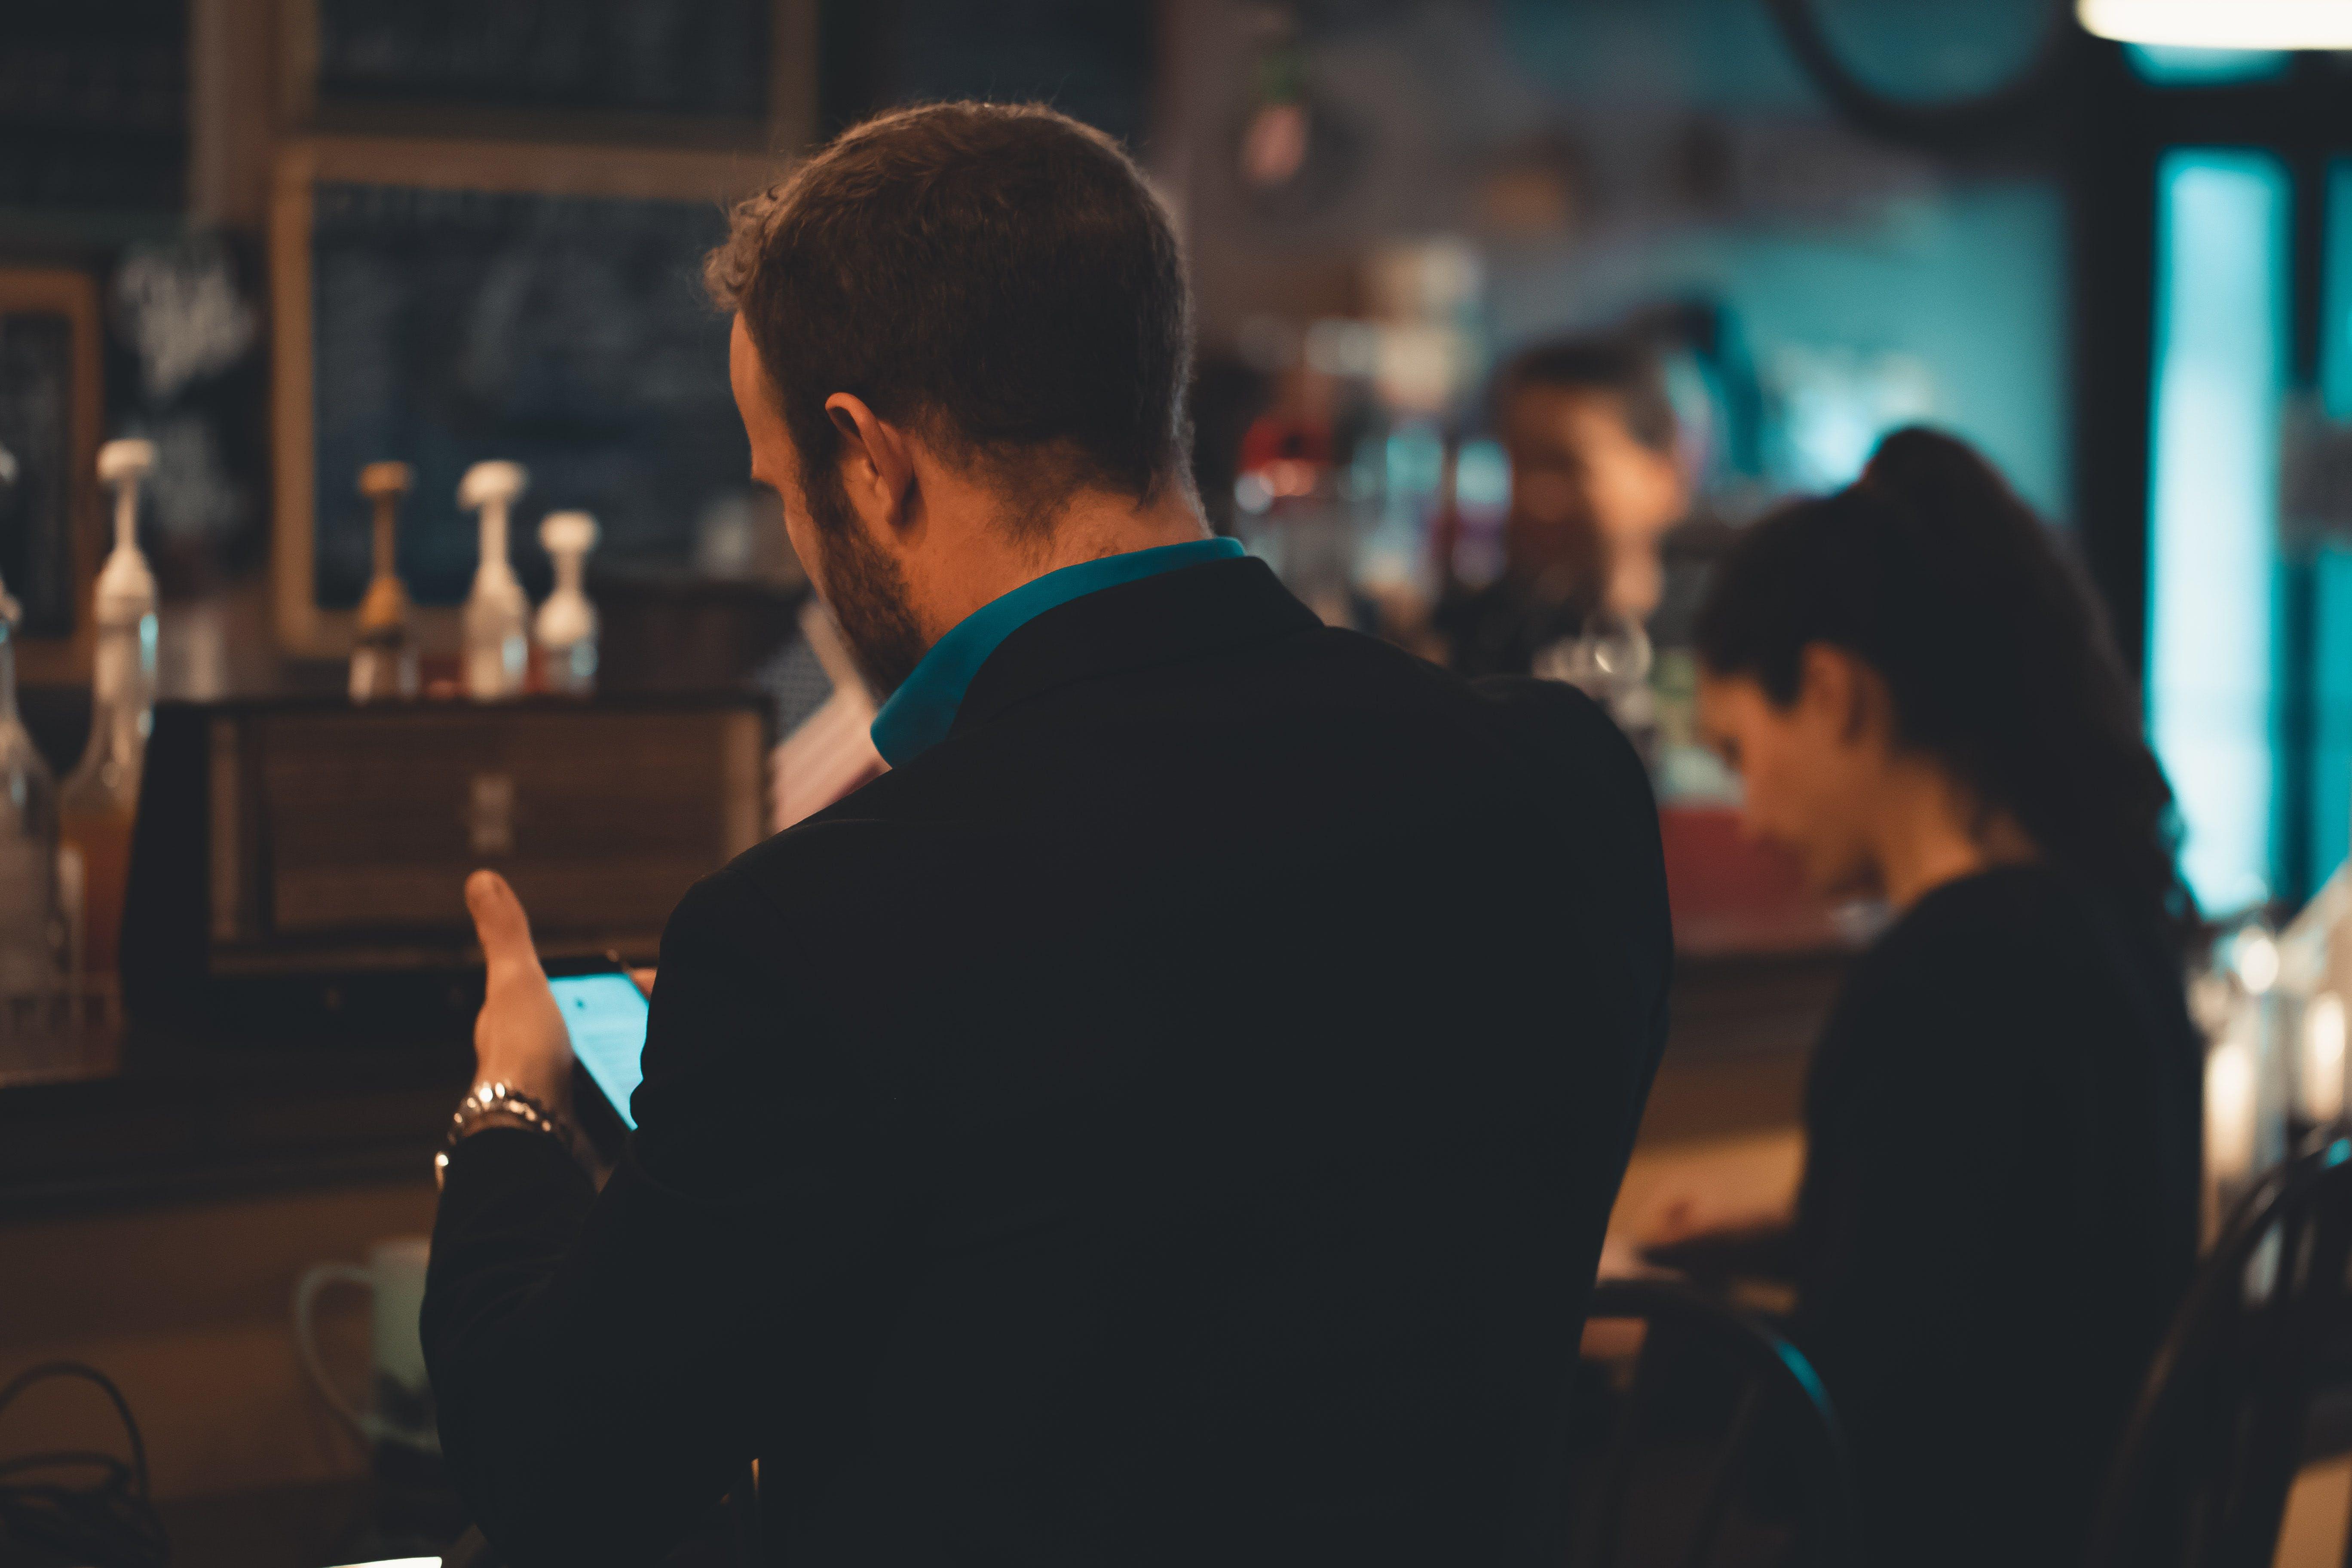 Man in Black Suit Jacket Using Smartphone Indoors in Tilt Shift Photography